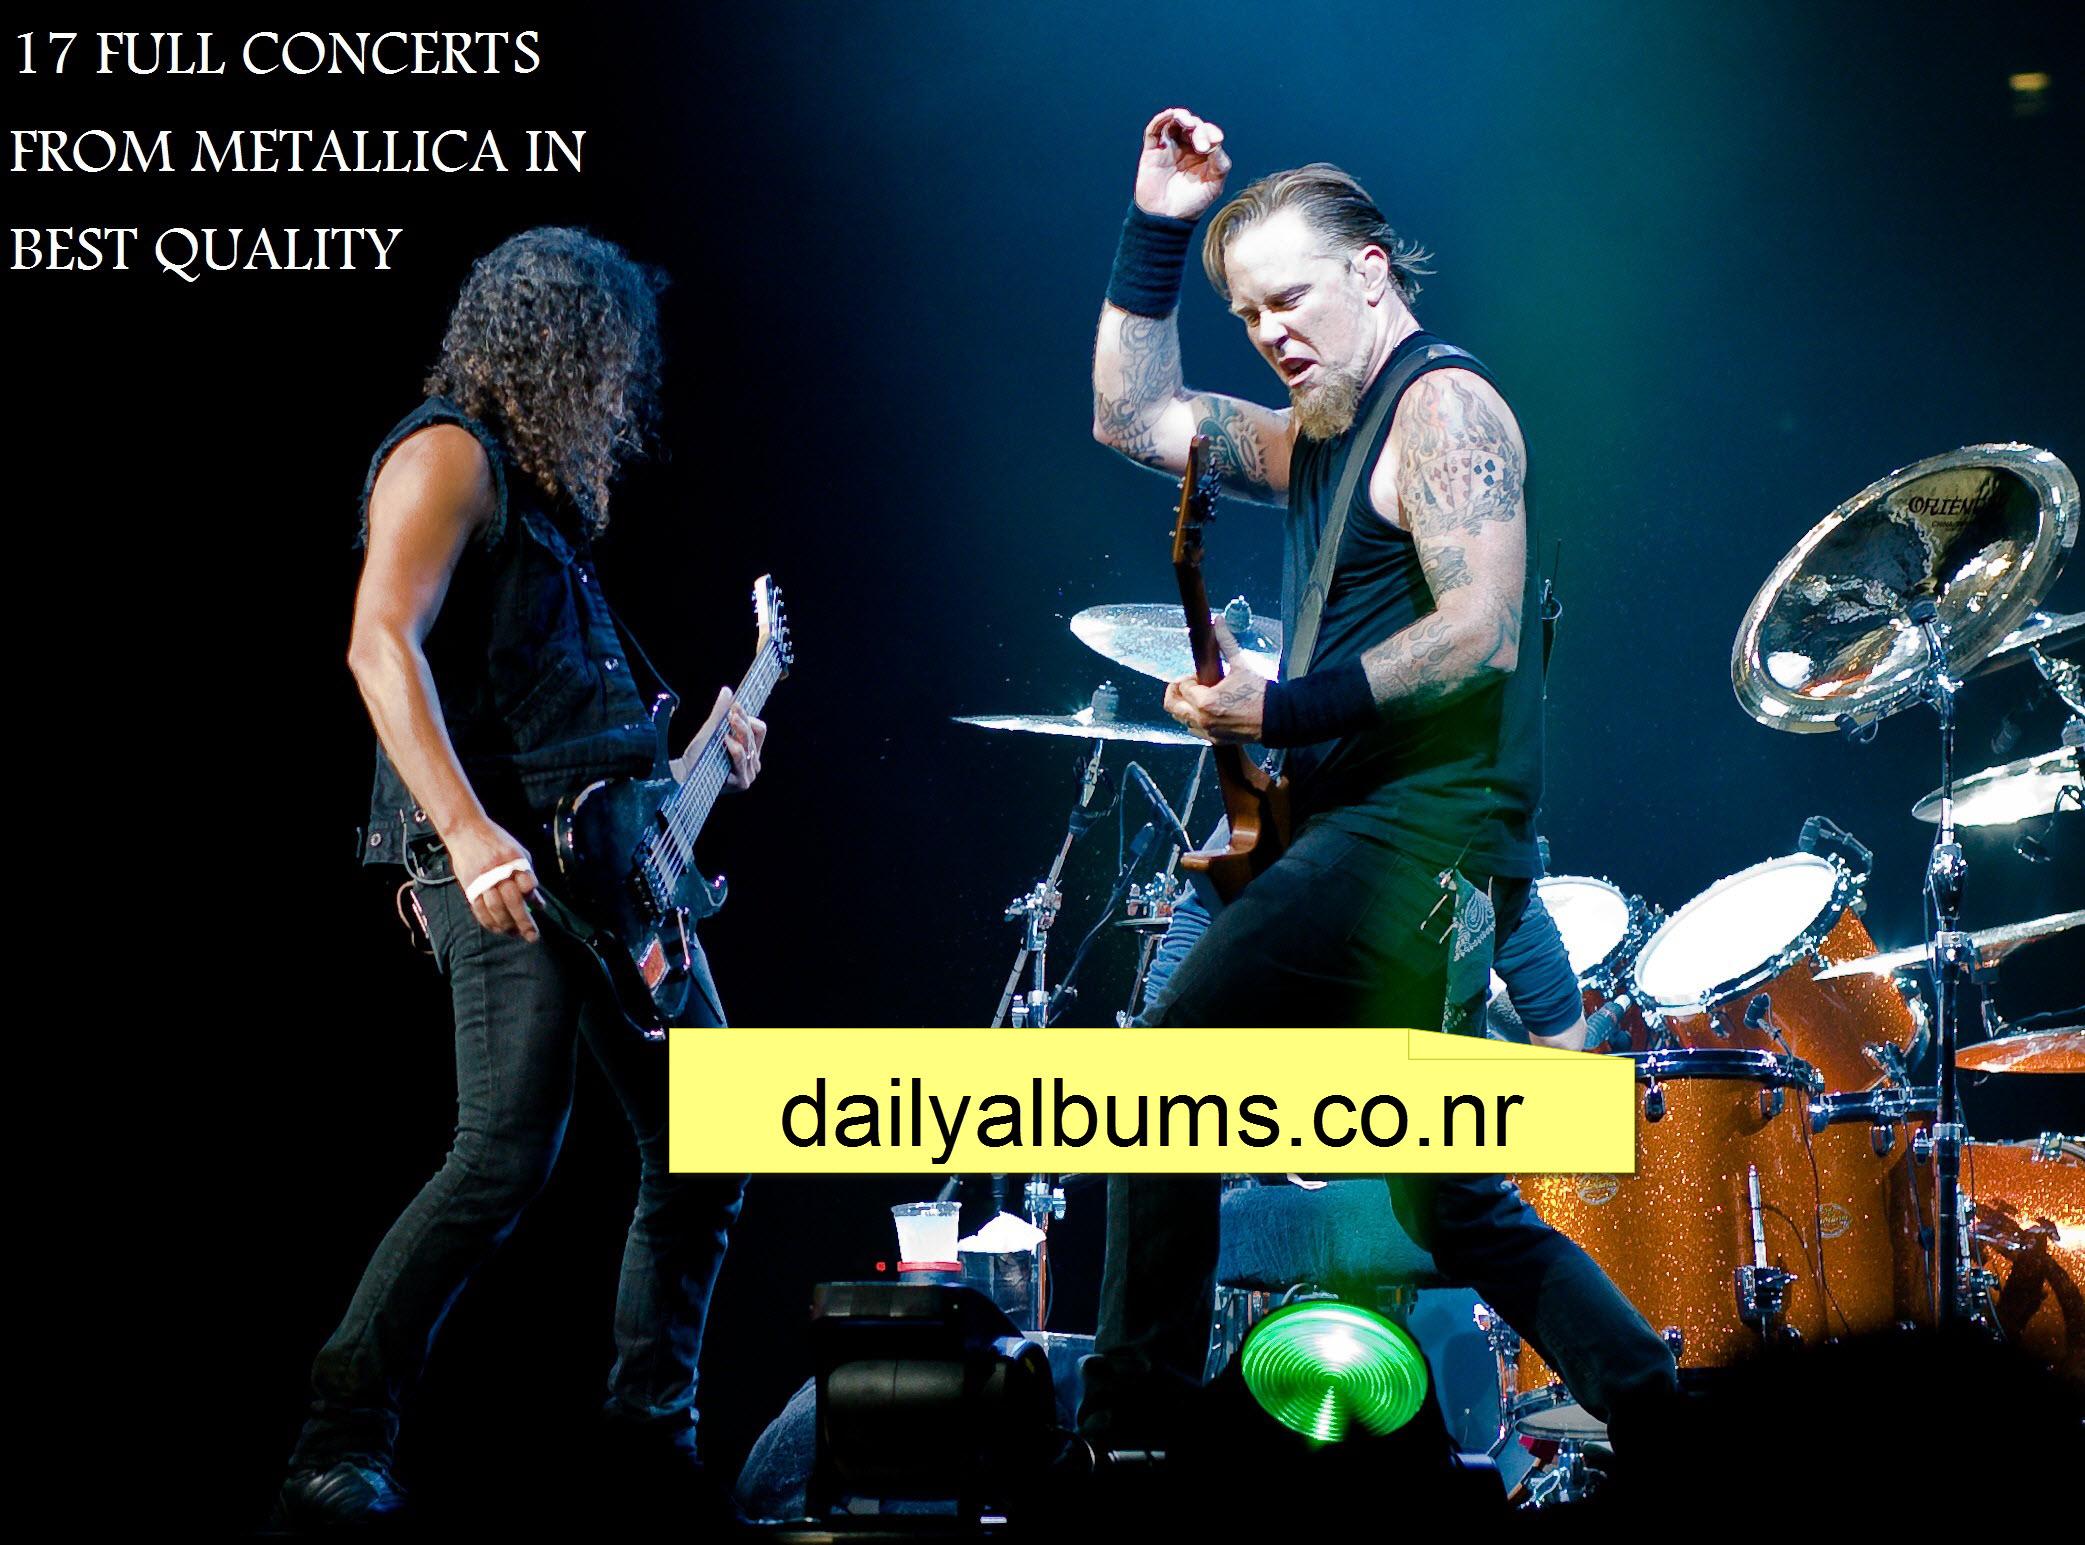 https://rozup.ir/up/dailyalbums/okay%20Metallica%2017%20FULL%20CONCERTS%20(DAILYALBUMS.CO.NR).jpg